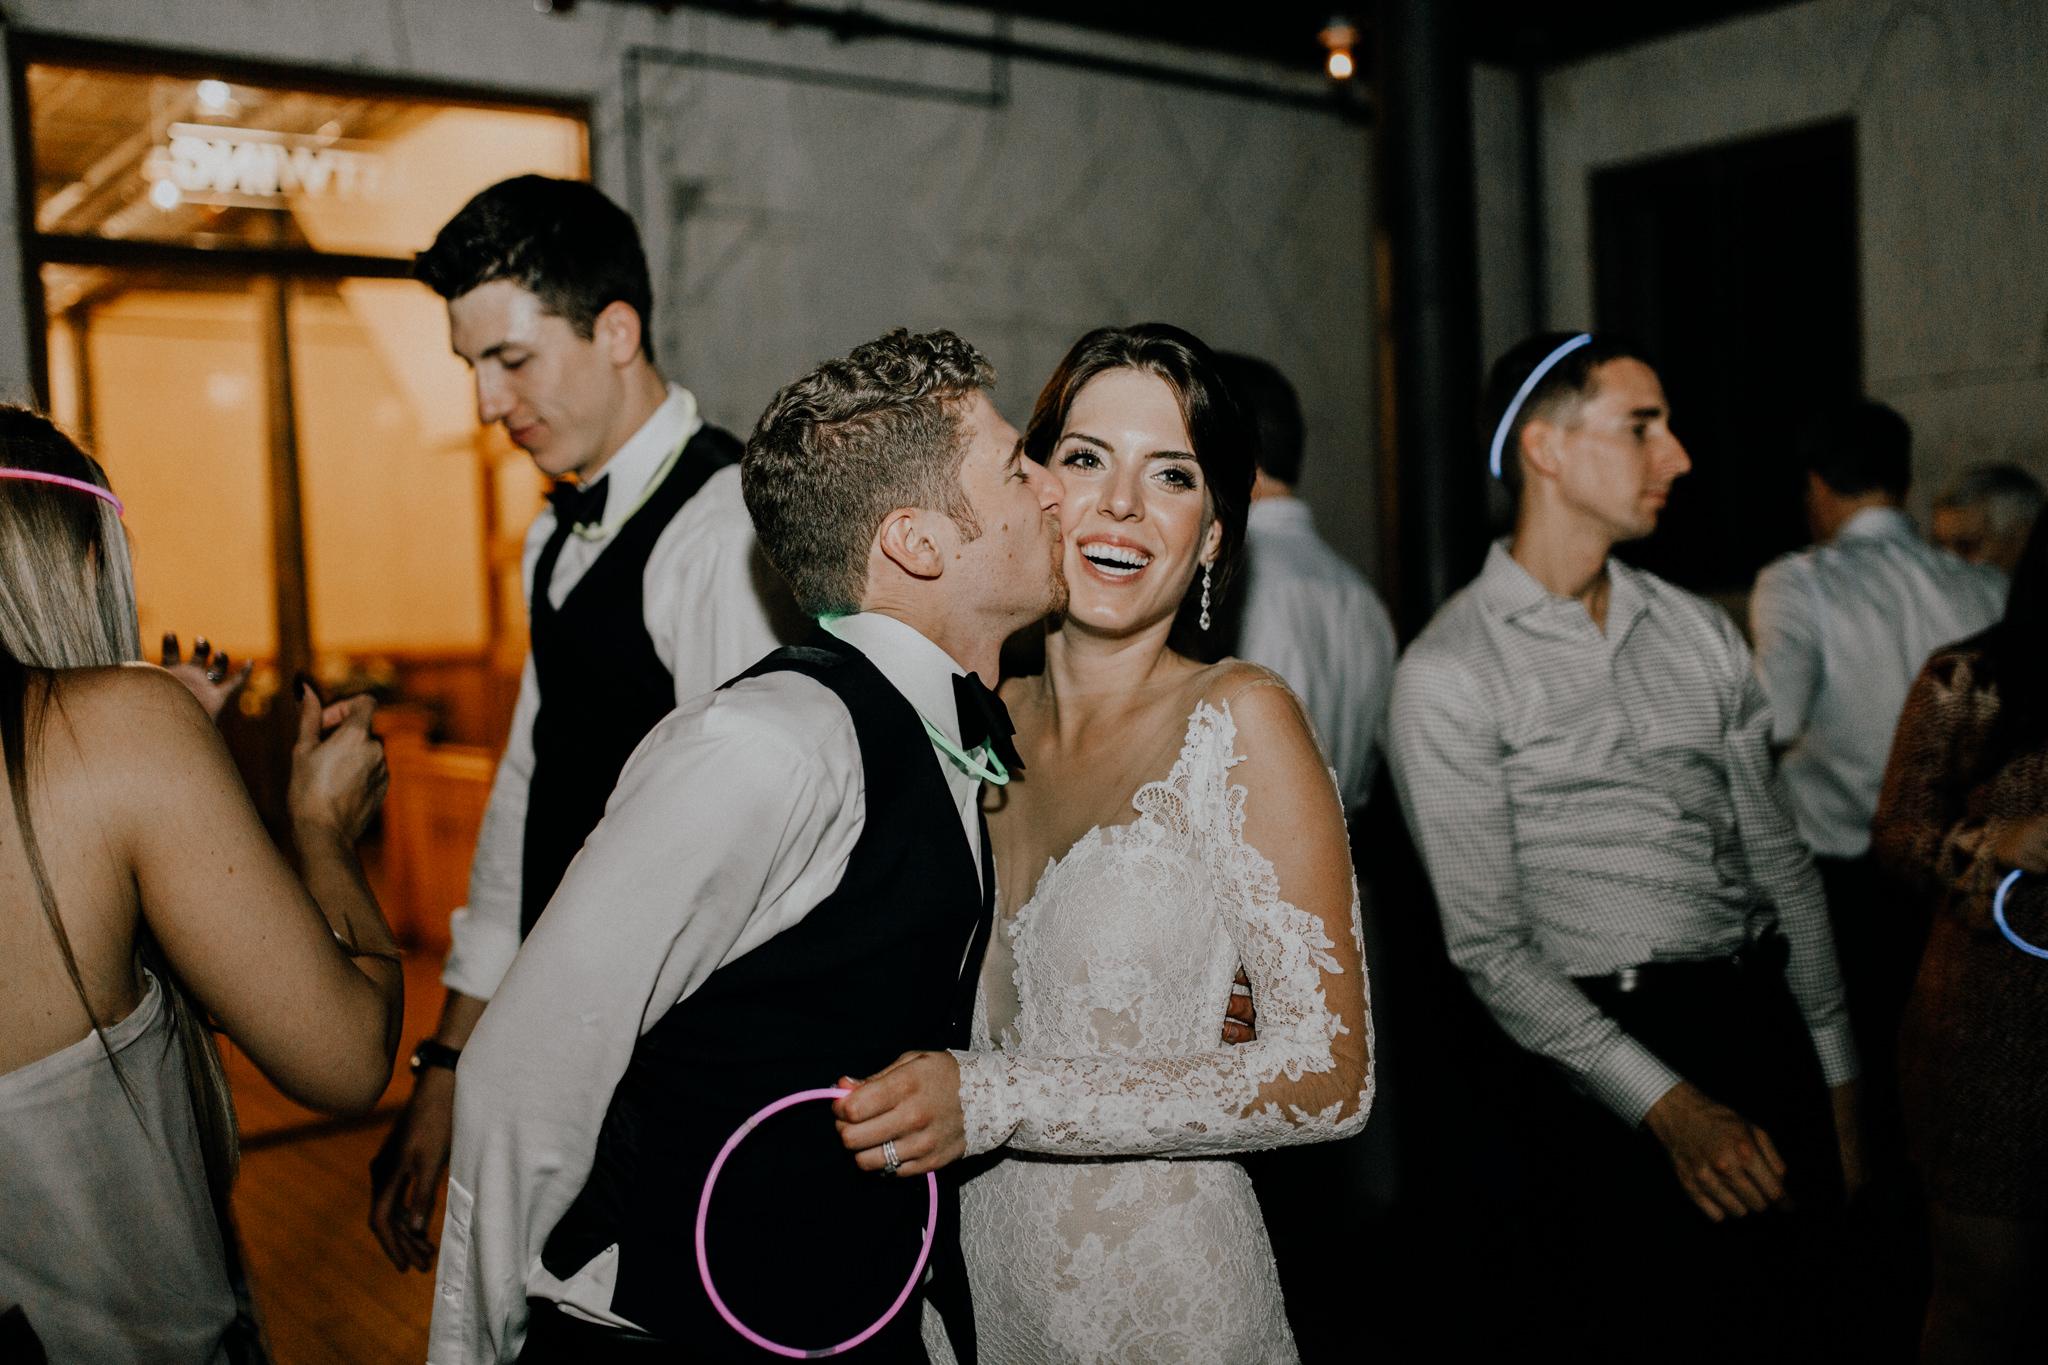 wedding-headlands-center-for-the-arts-sausalito-150.jpg